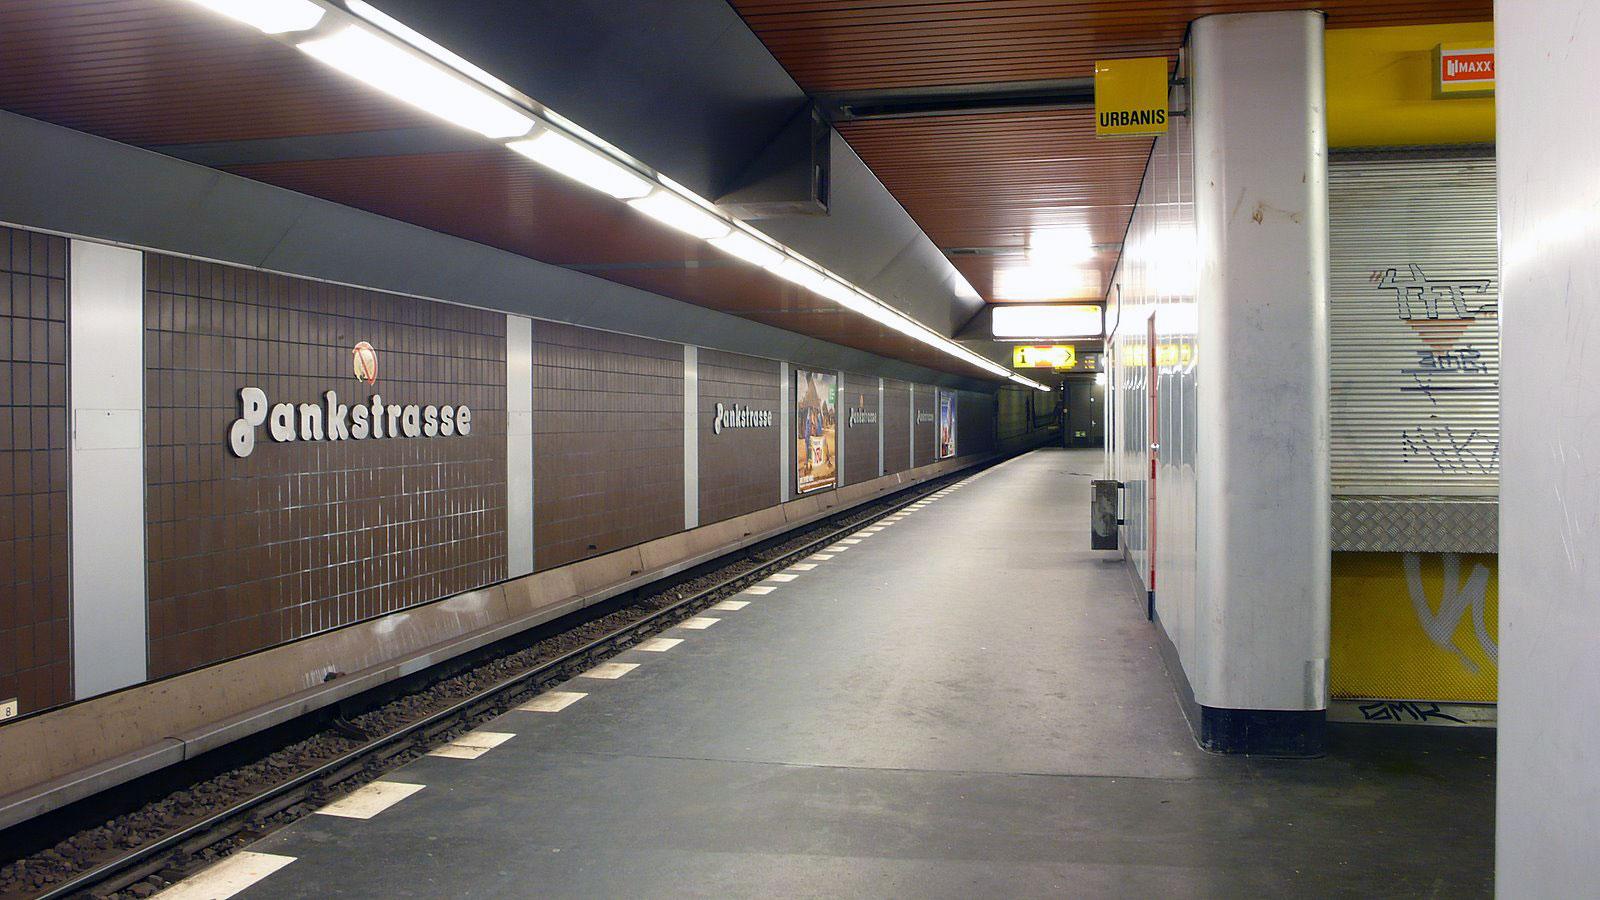 U-Bahnhof_Pankstraße-Phaeton-cc-ladoberlin